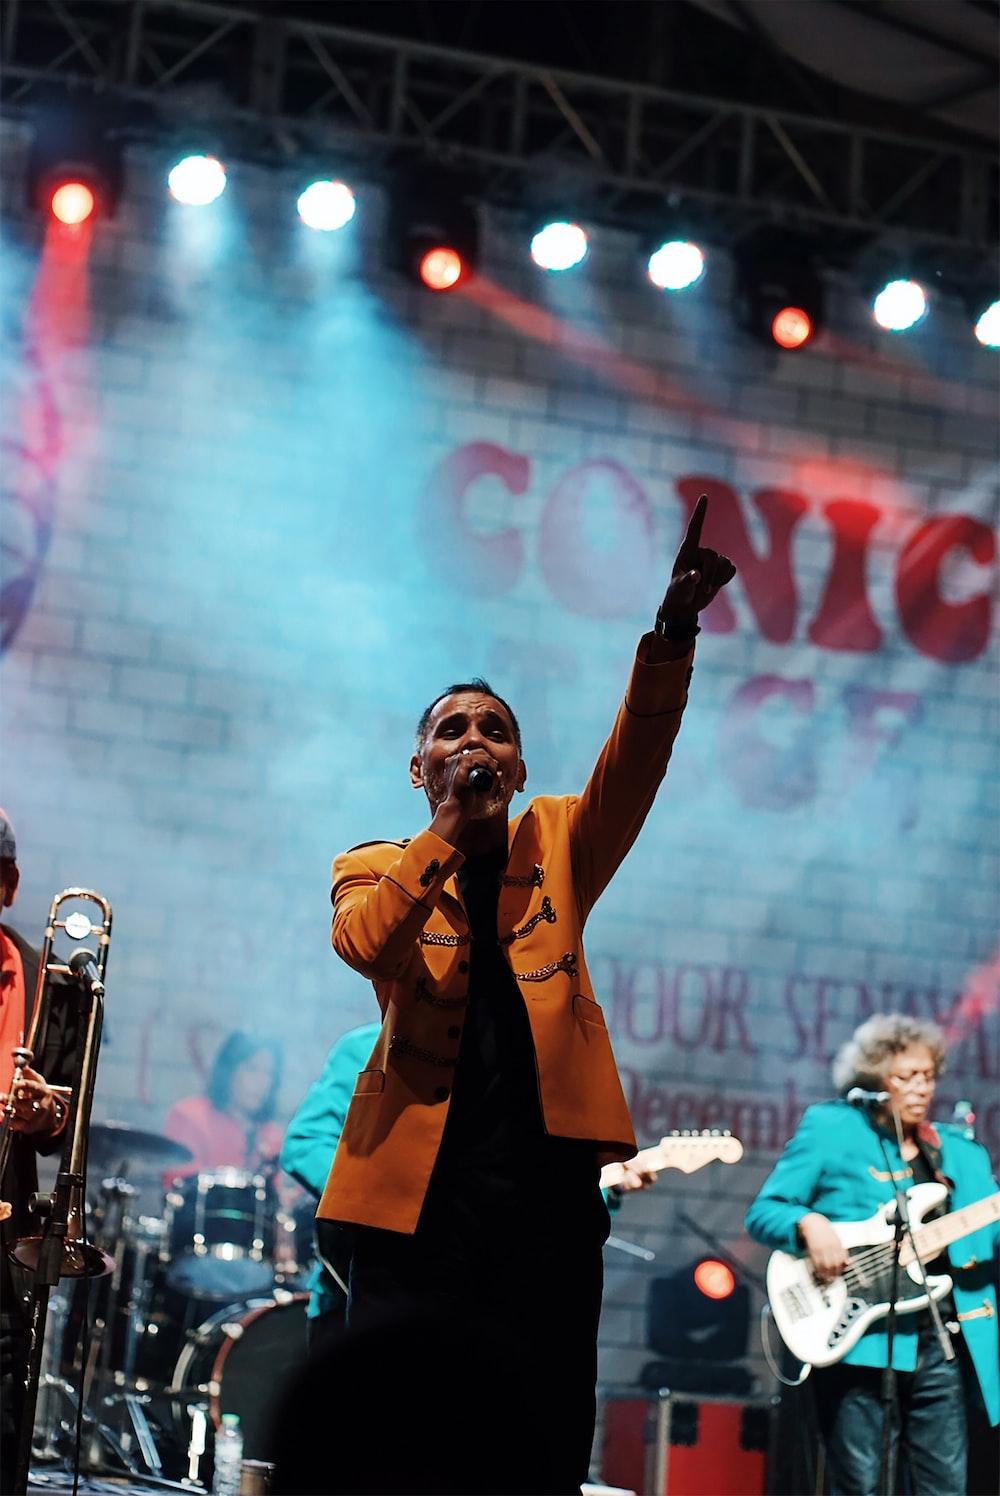 man in brown coat singing on stage